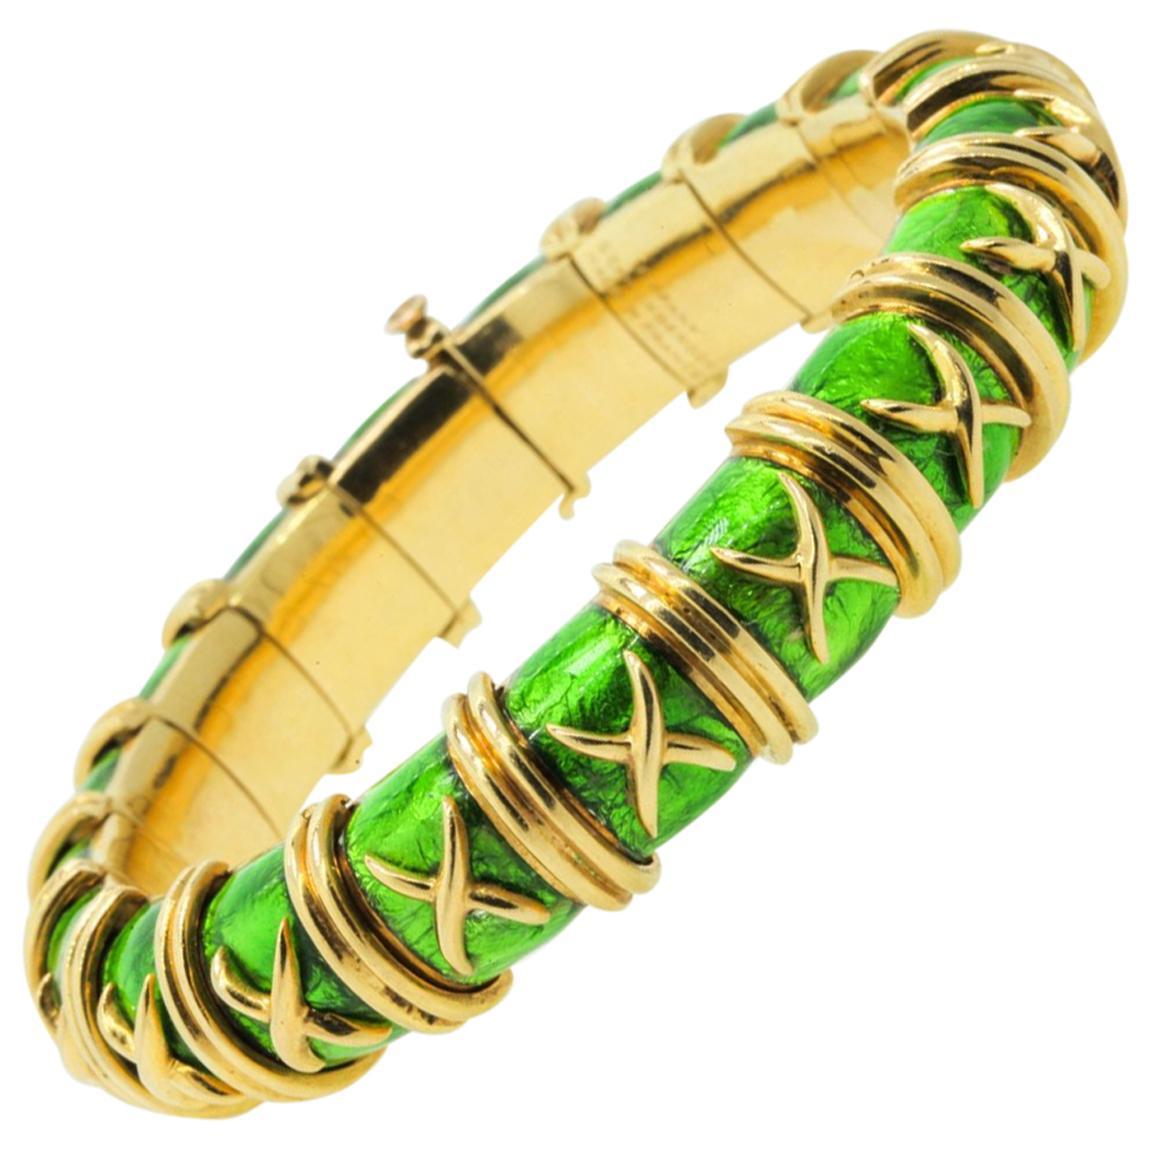 Tiffany & Co. Schlumberger Croisillon Bracelet